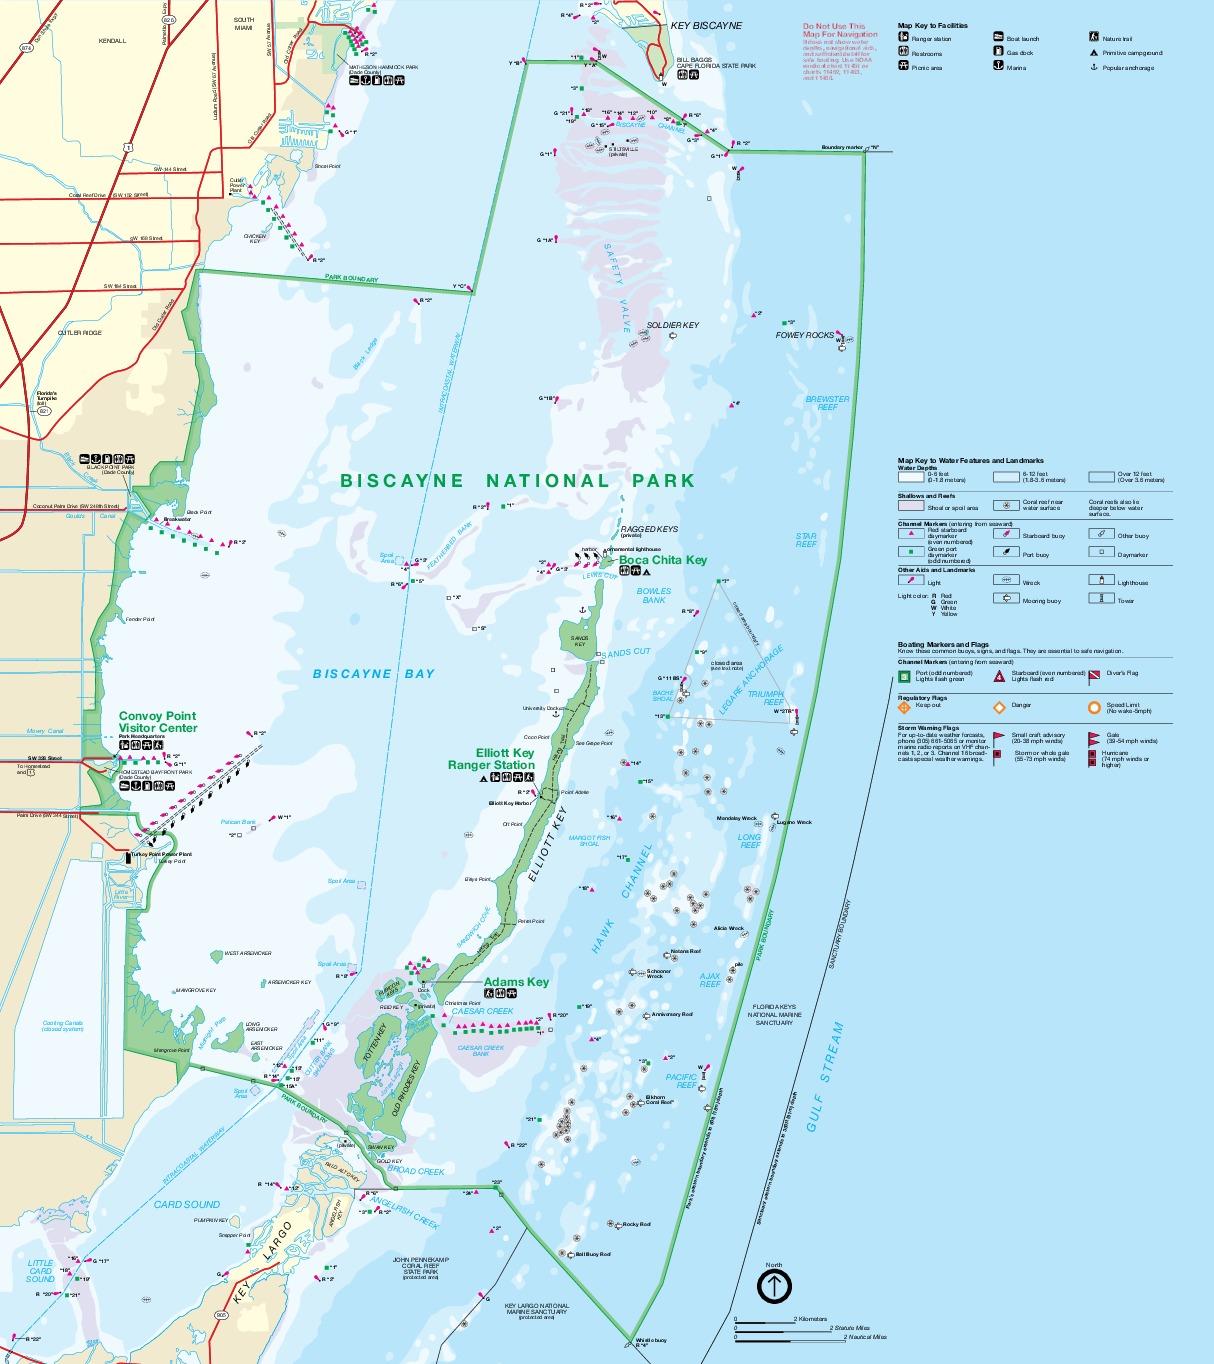 Biscayne National Park Map, Florida, United States